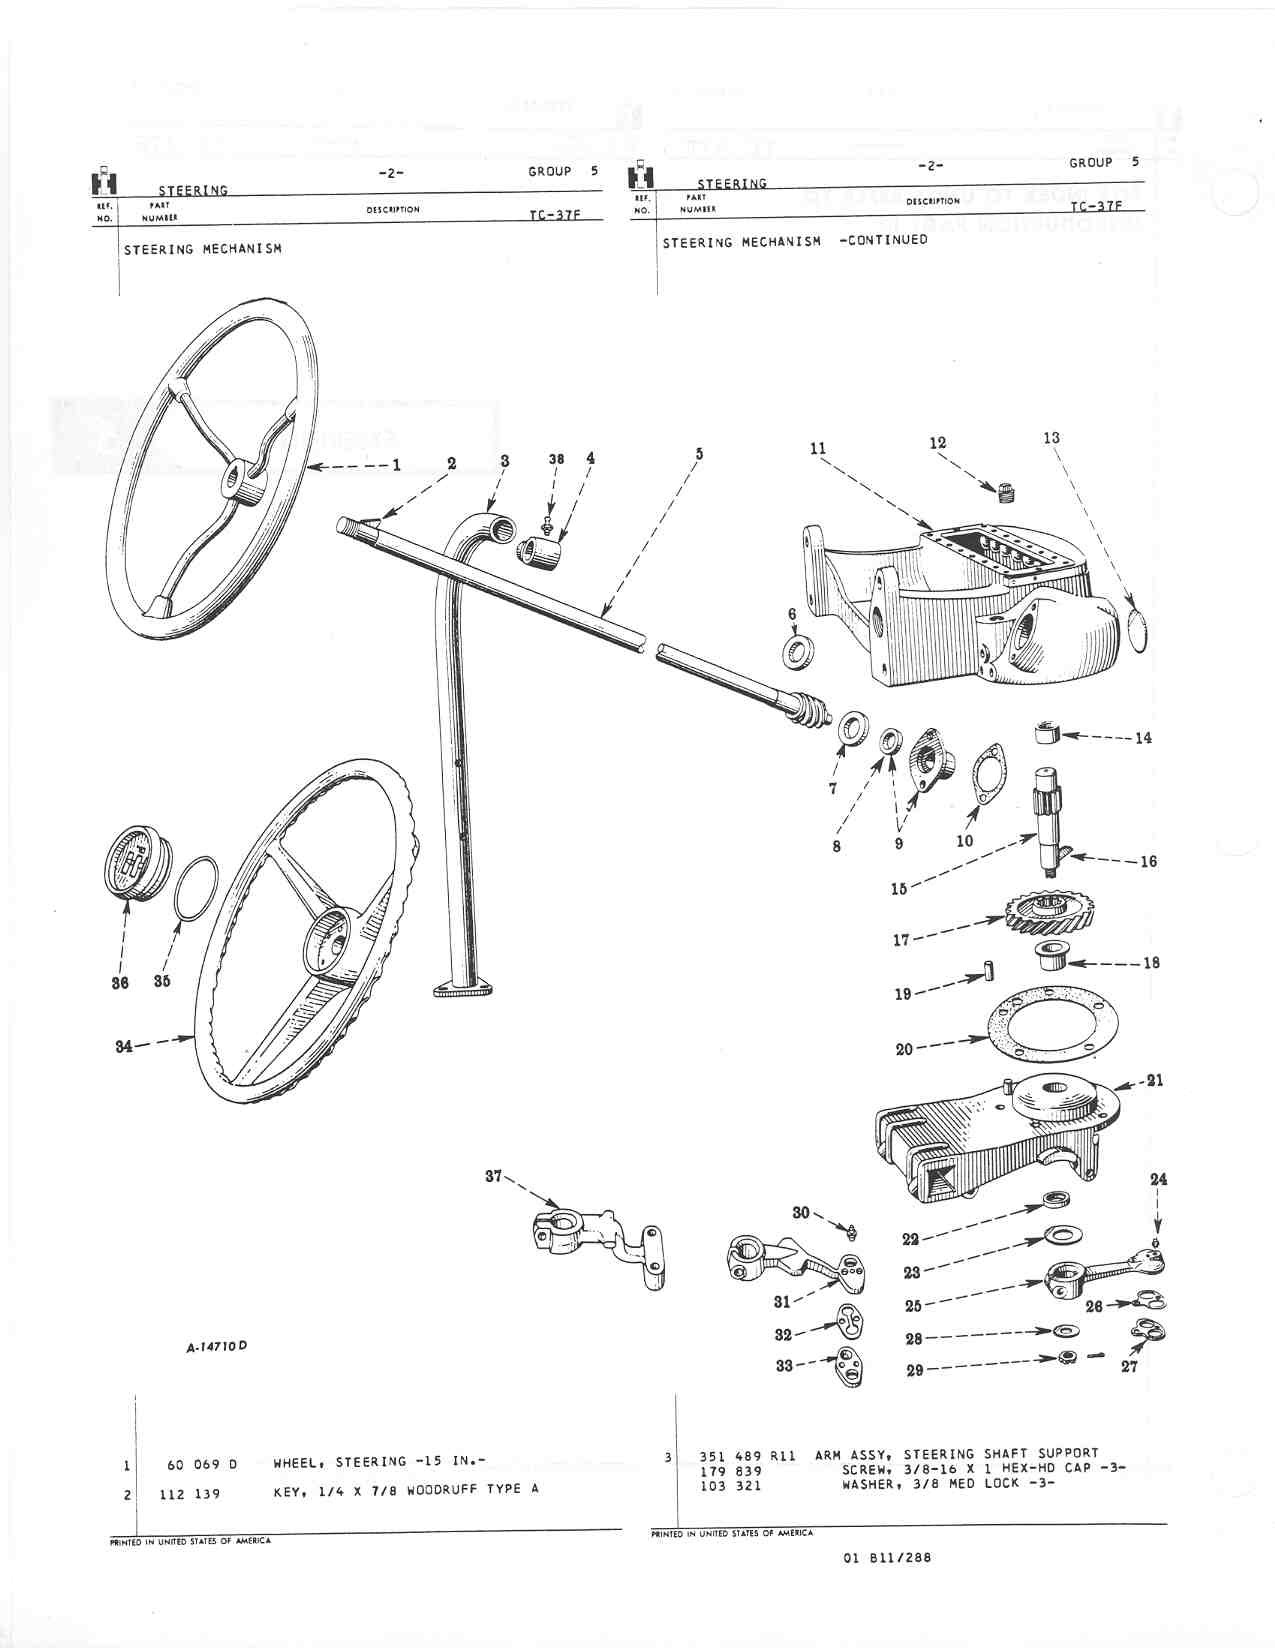 1945 Farmall Cub Parts Diagram - Wiring Diagram Bookmark on